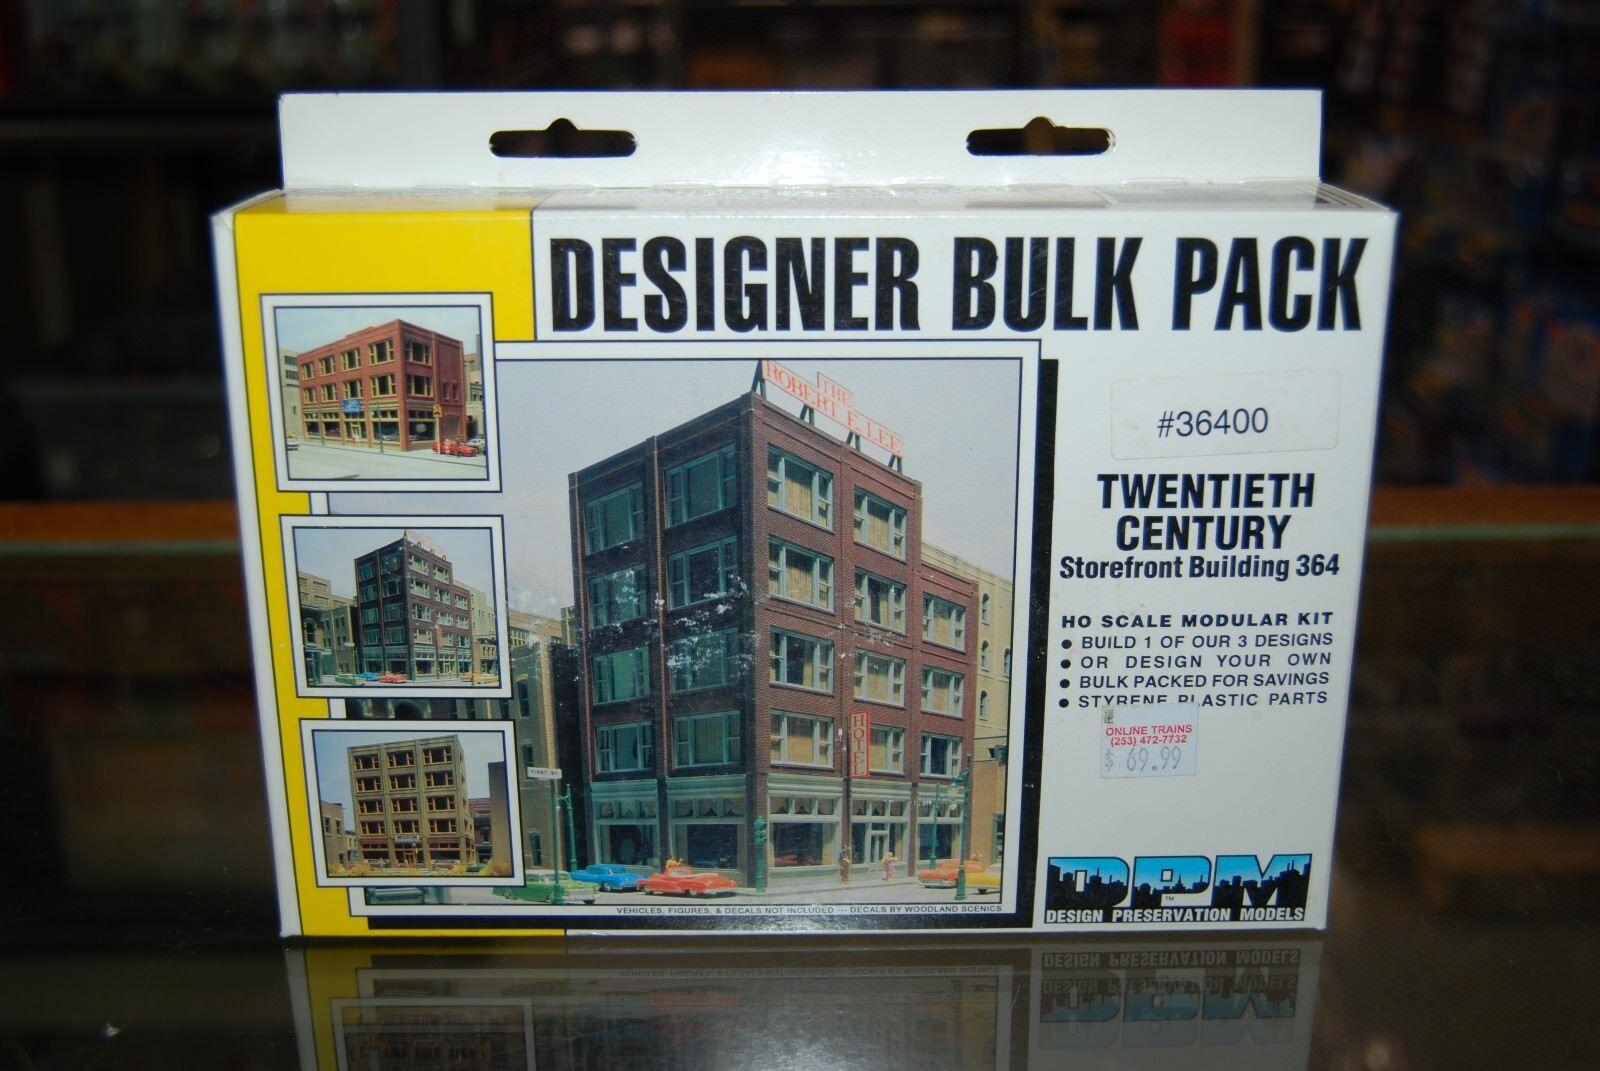 HO Scale DPM Modulars 36400  Designer Bulk Pack, Twentieth Century Storedavanti